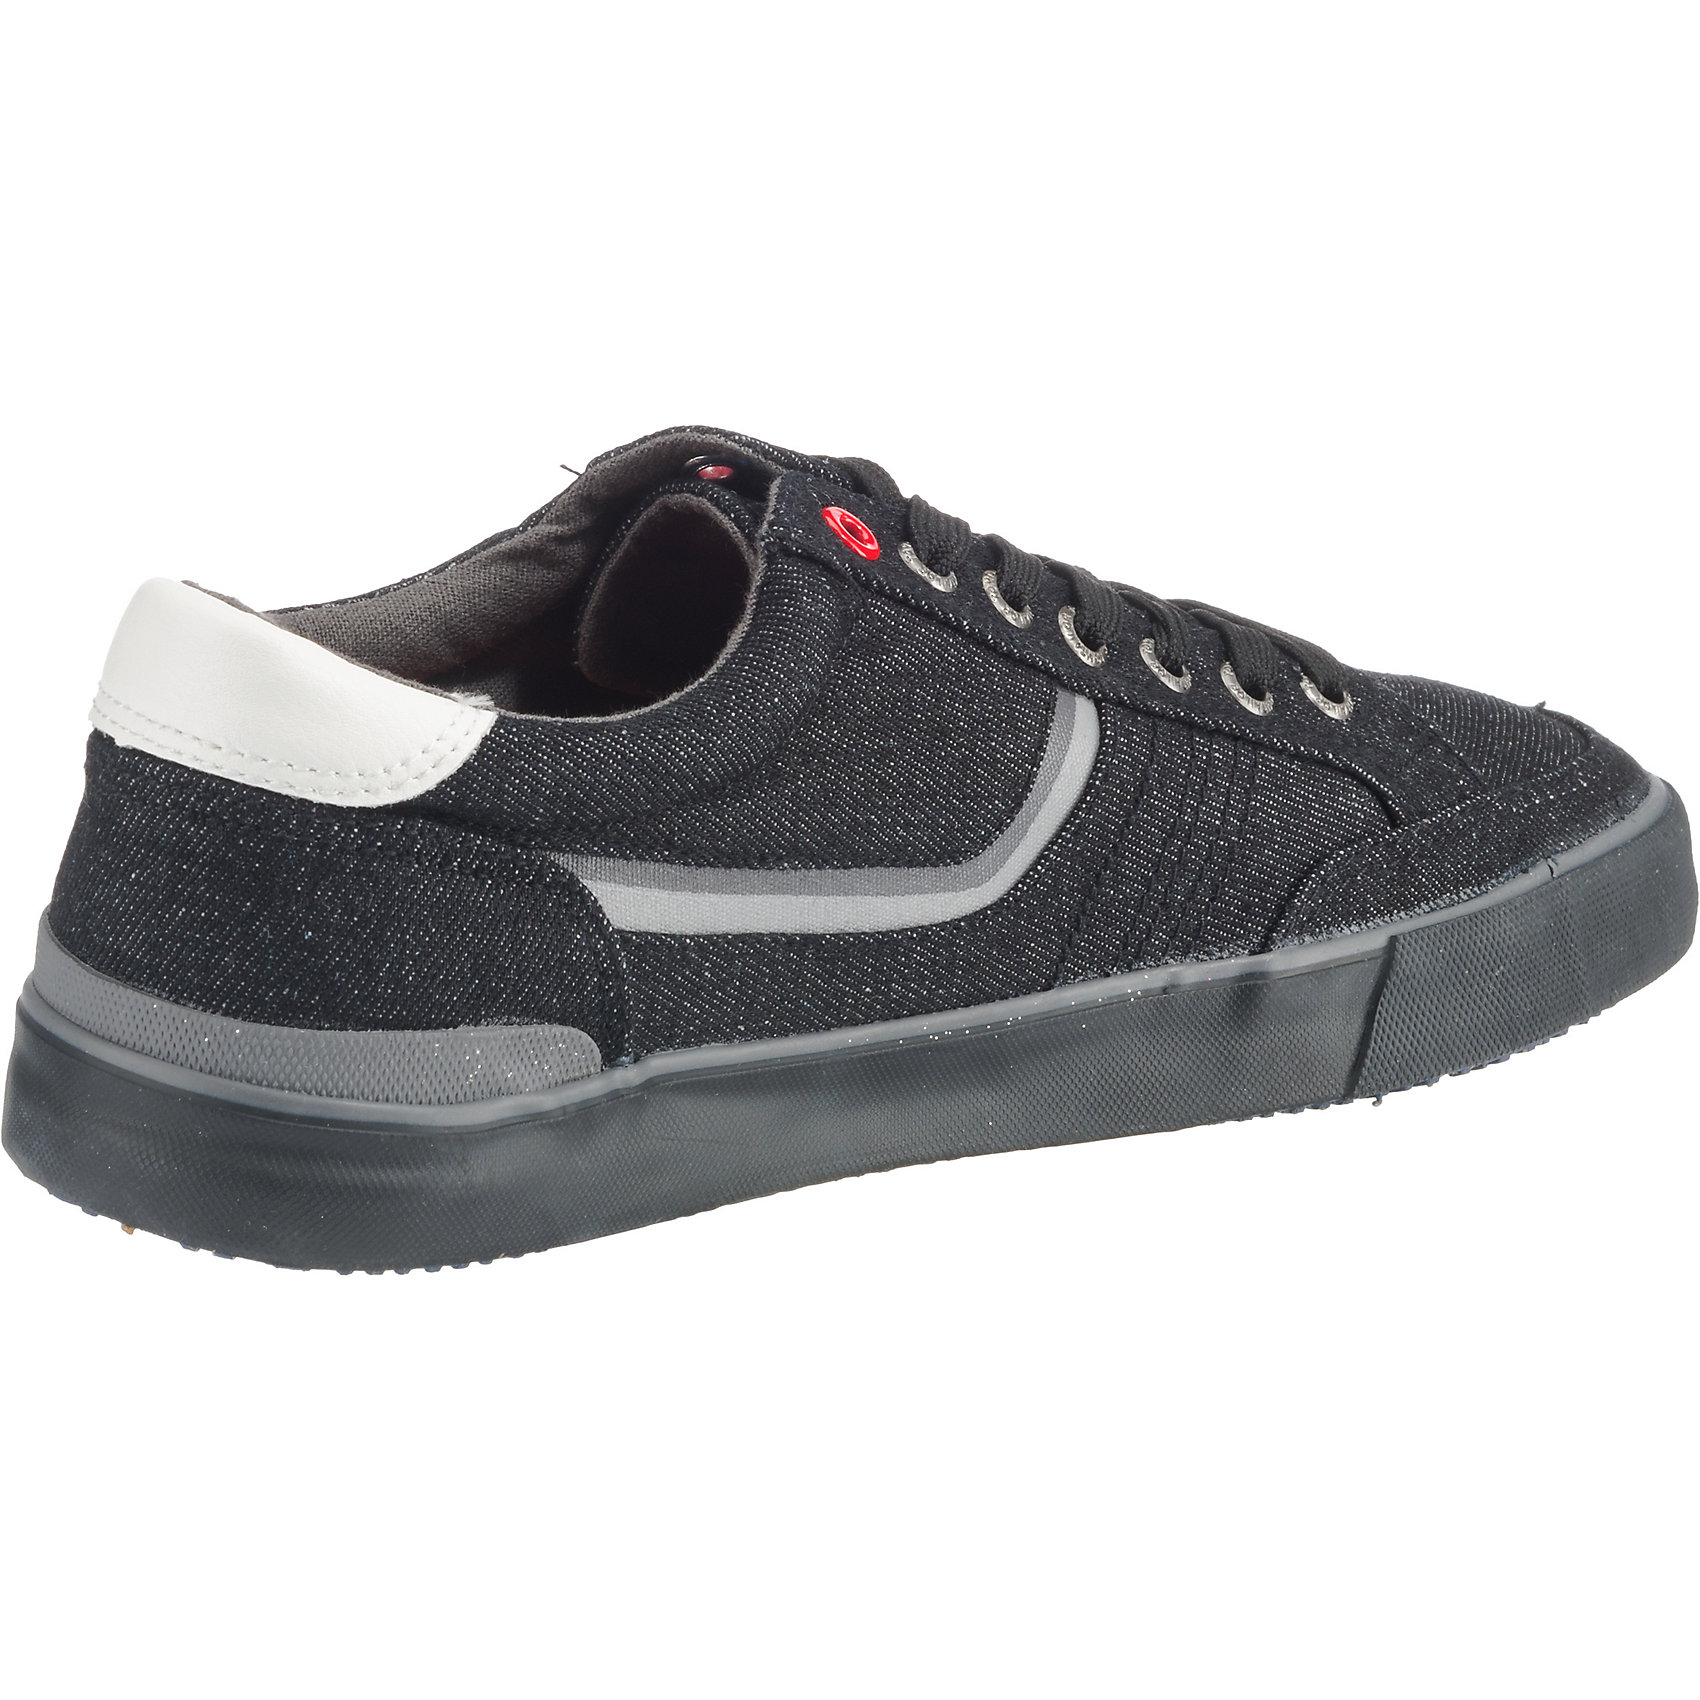 Neu 10406804 Tailor Sneakers Weiß Für Schwarz Tom Low Herren EDIH29W